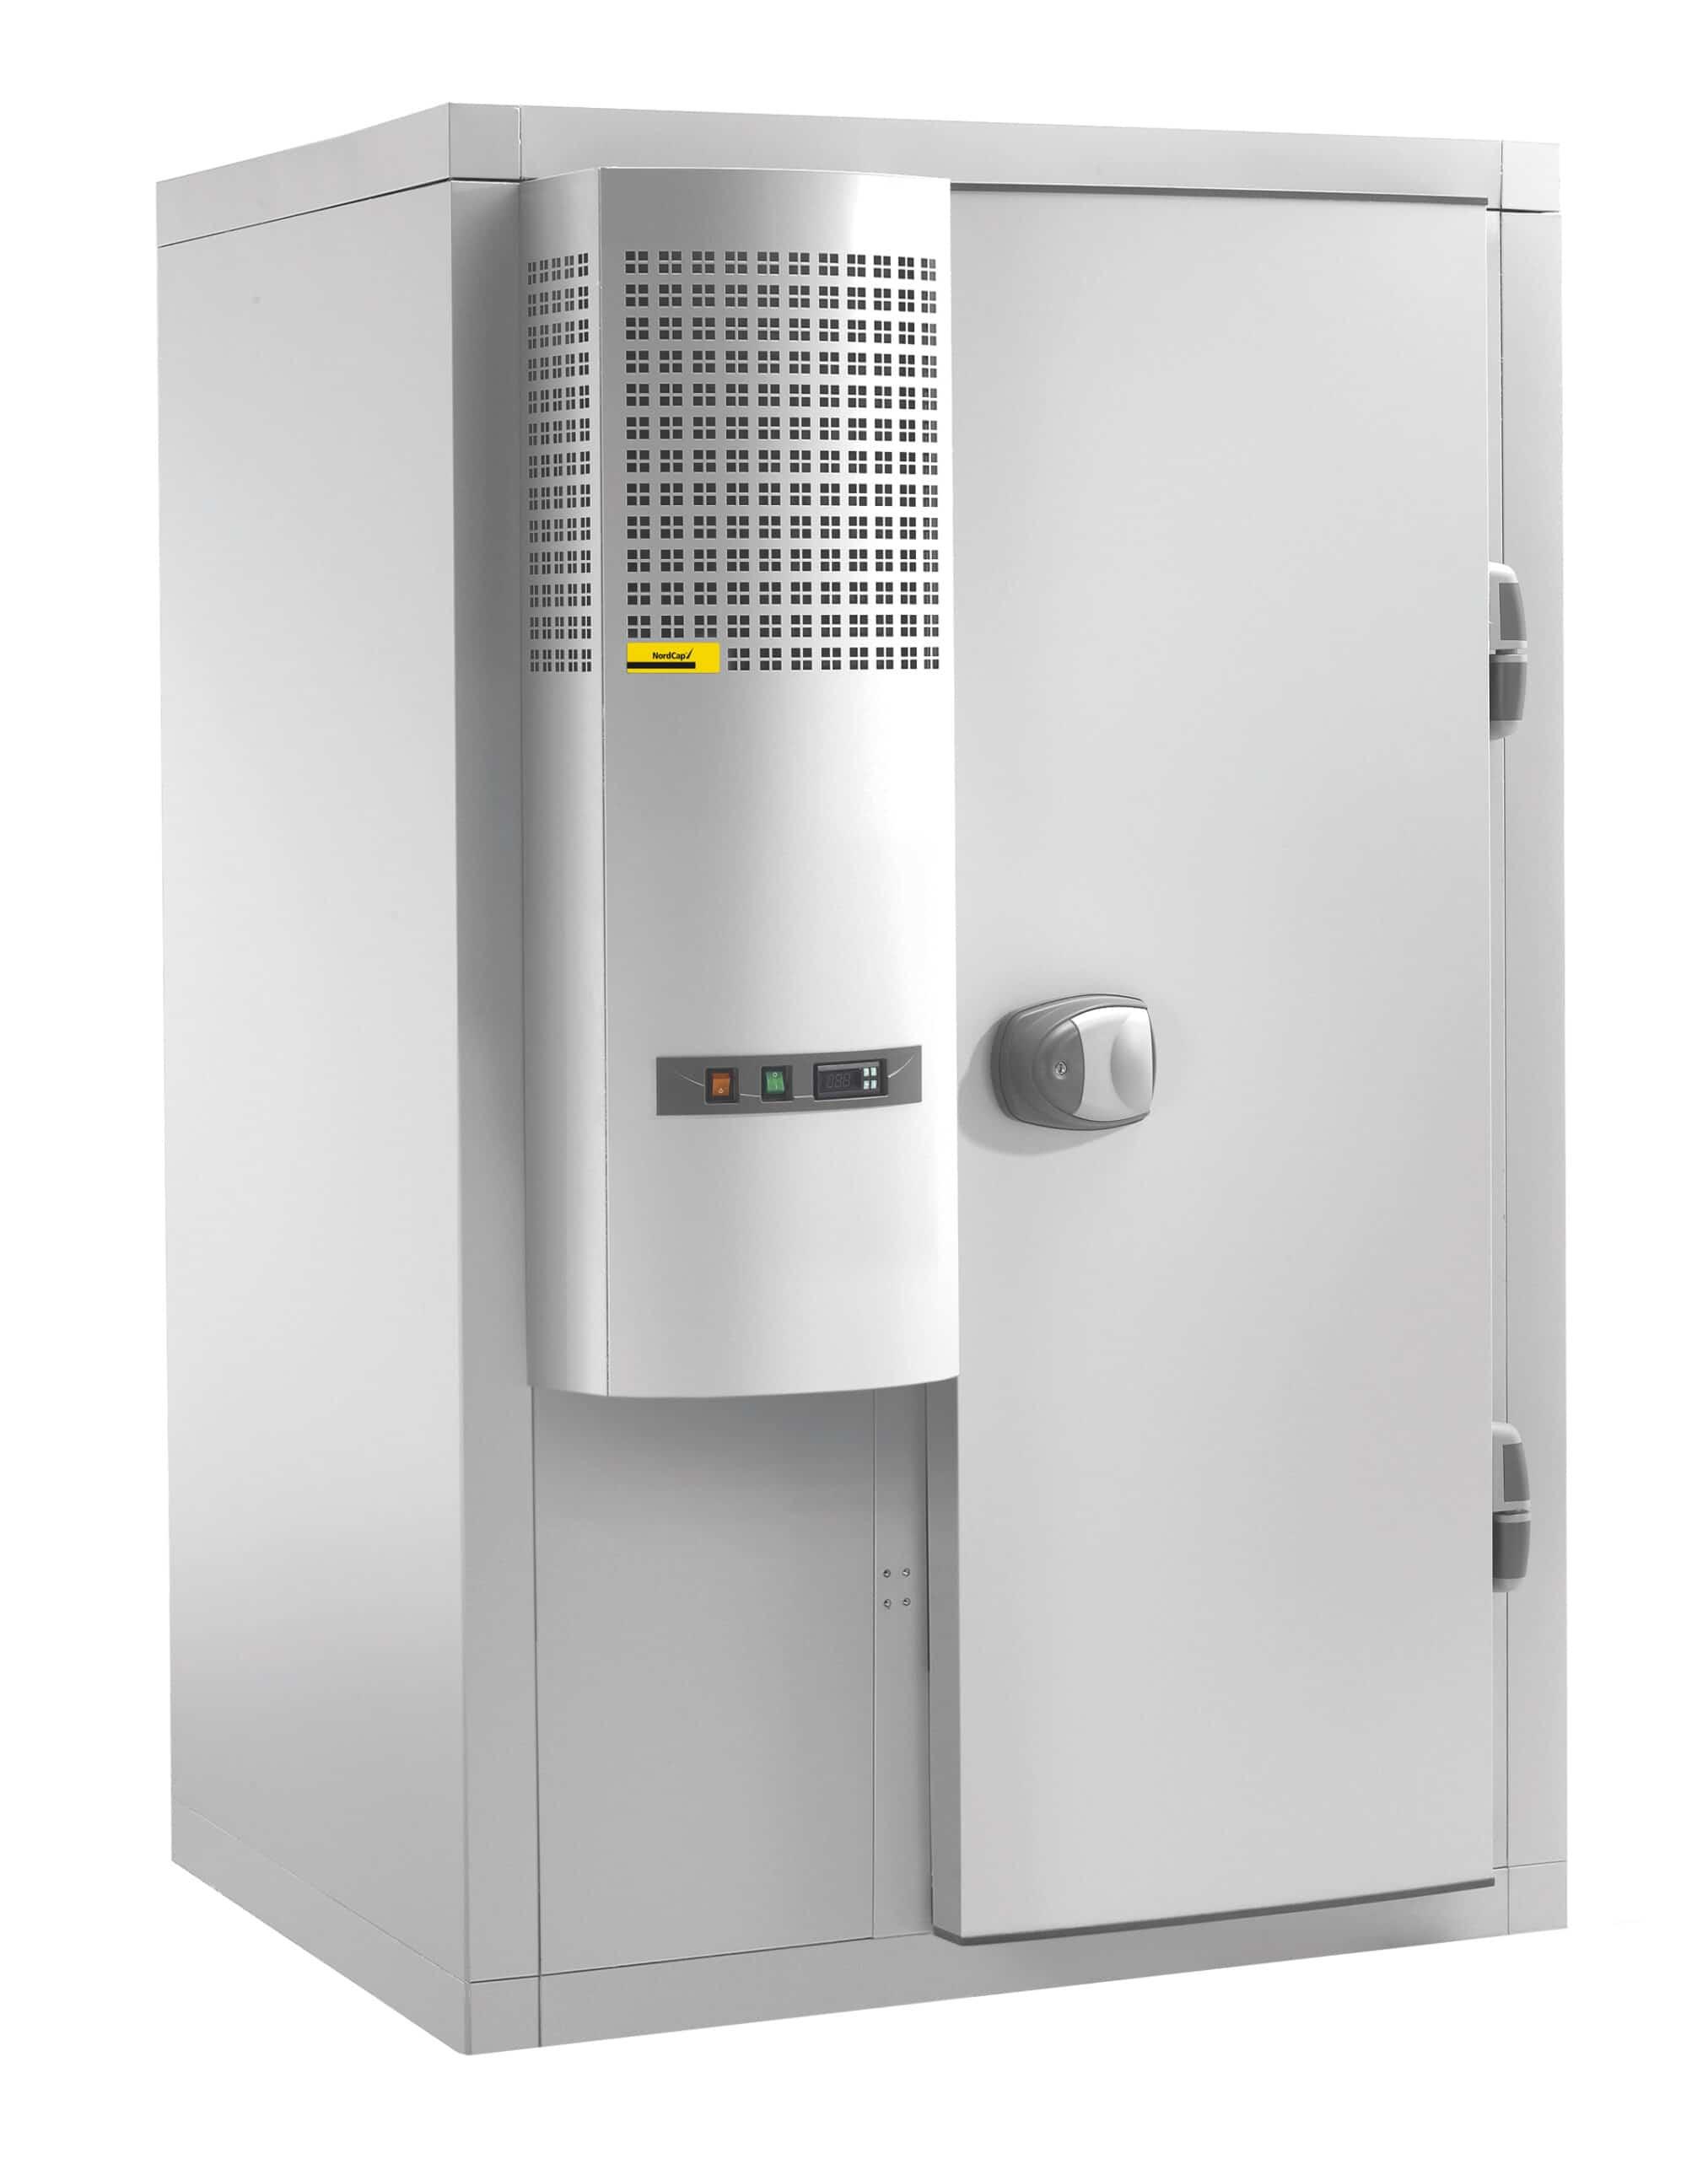 Kühlzellen GS-Z mit integrierten Kühlaggregat - Höhe 2110mm